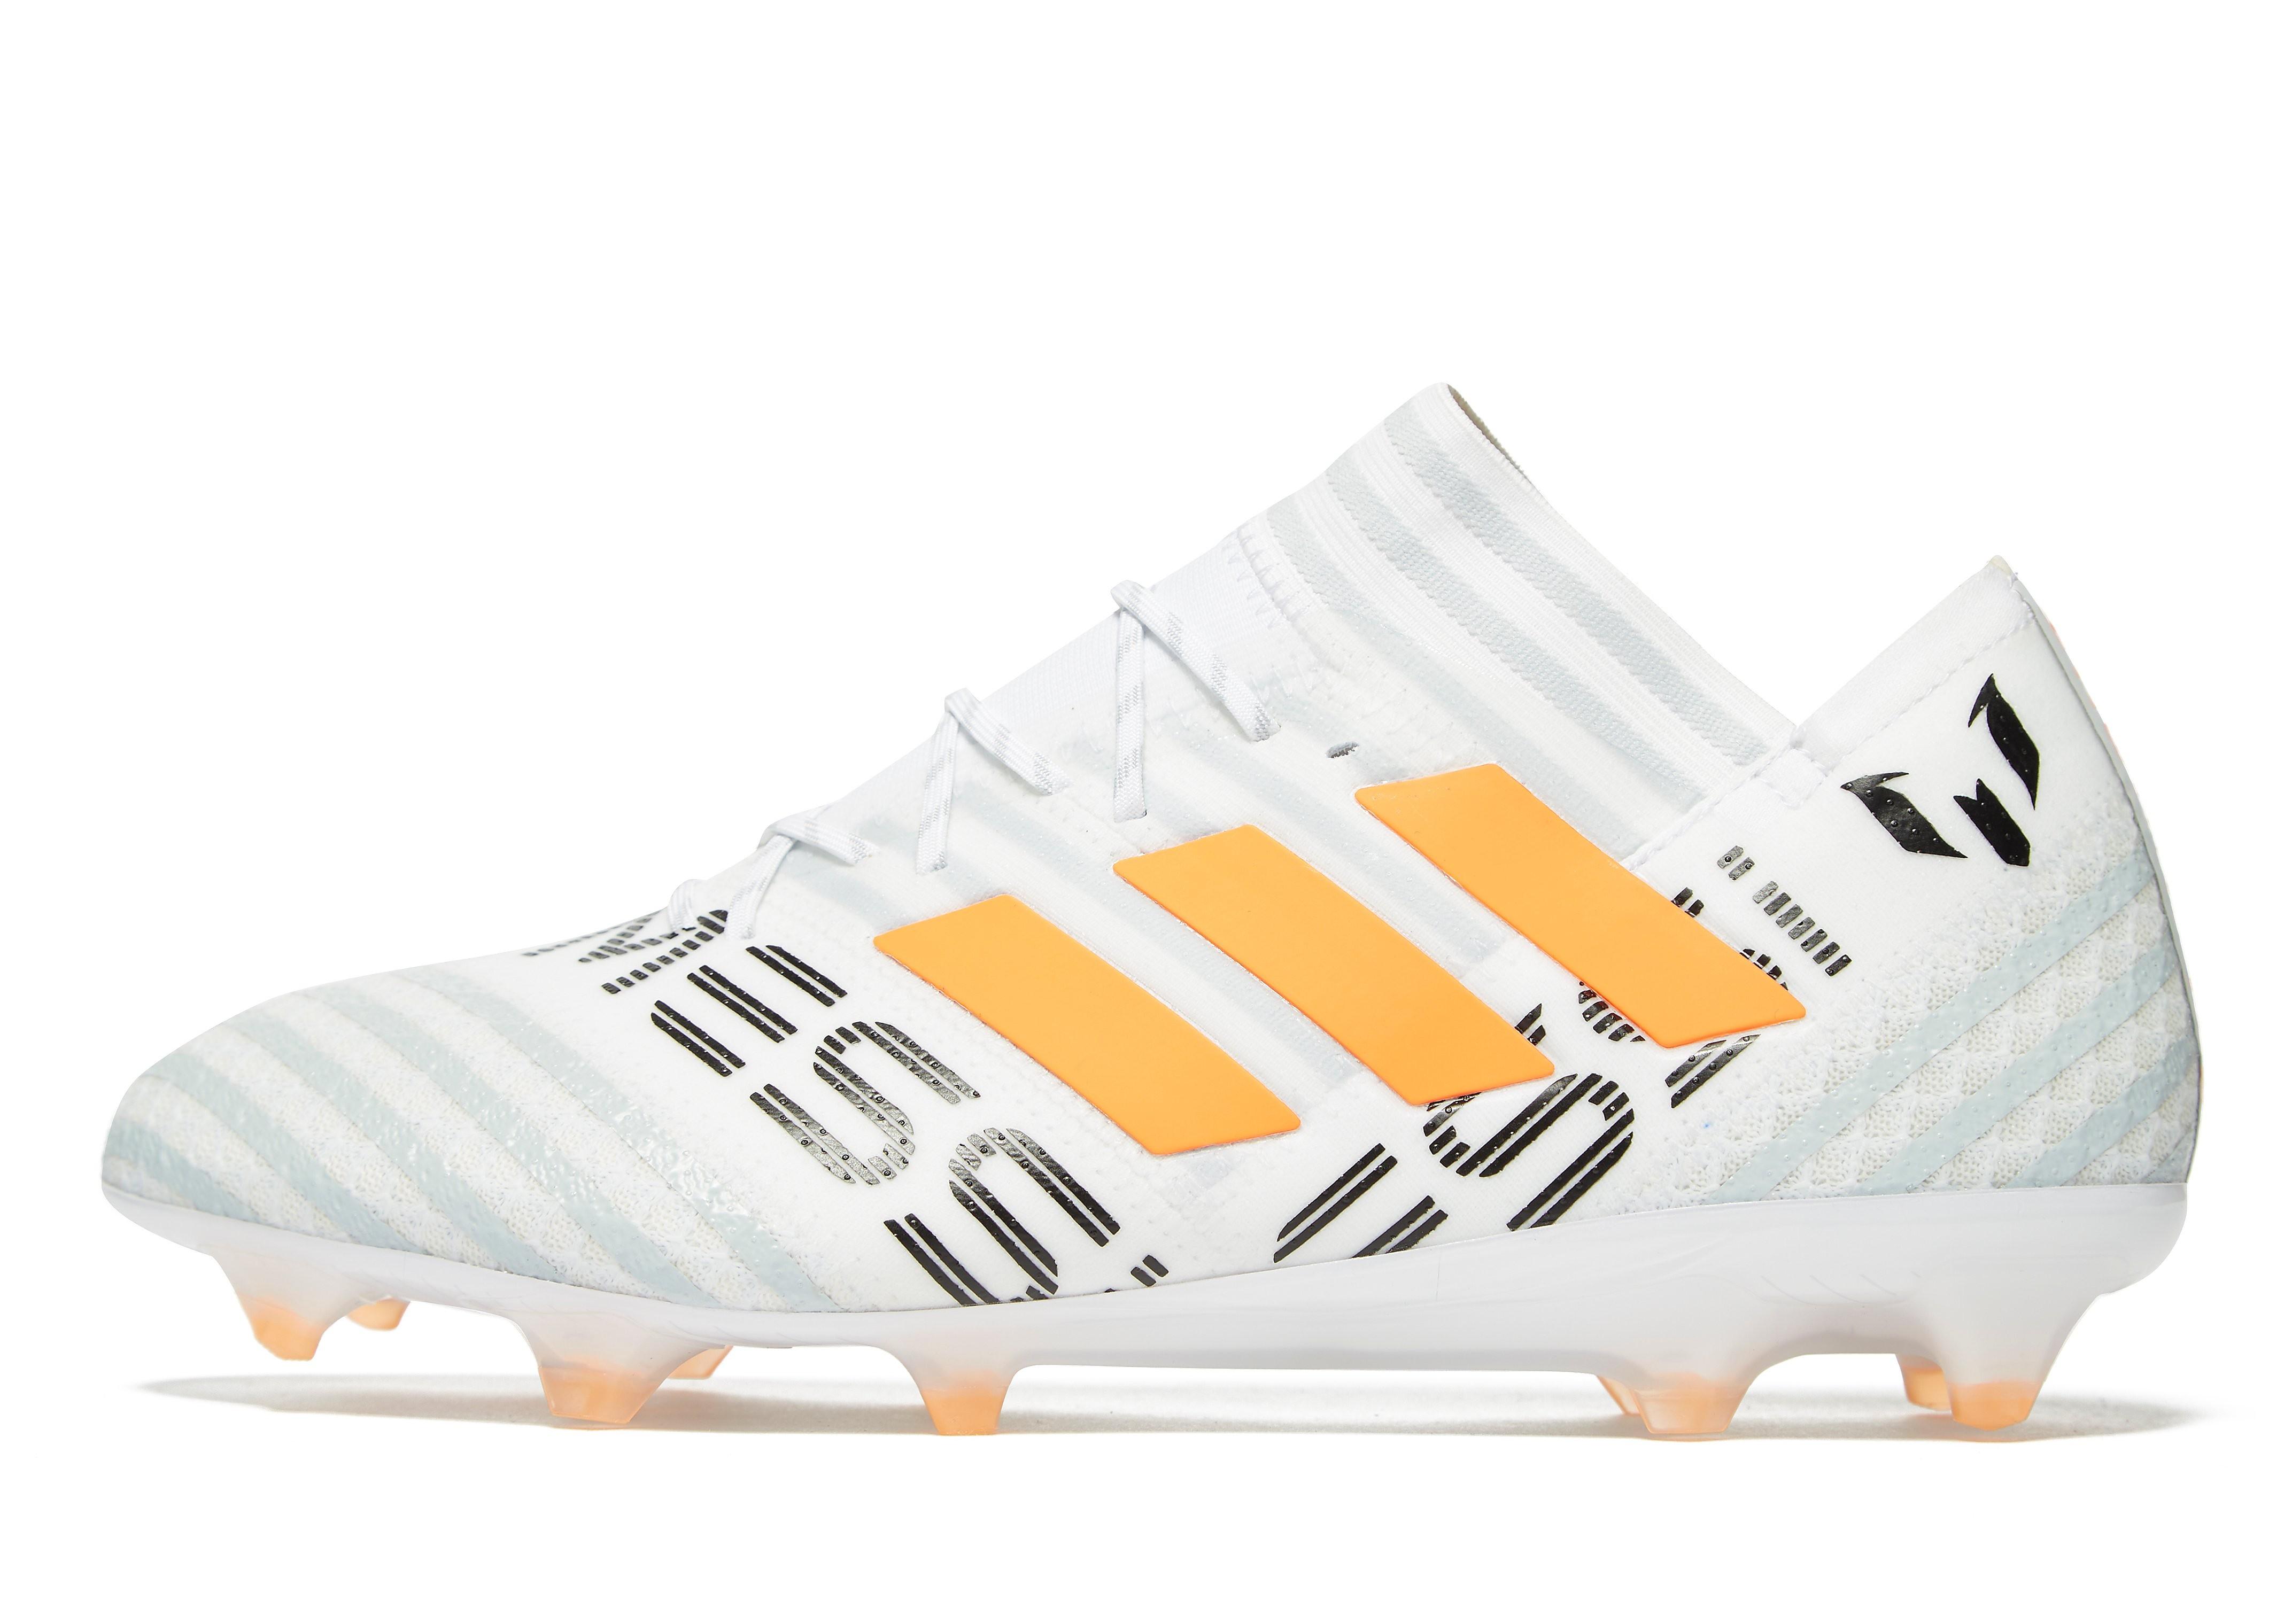 adidas Pyro Storm Nemeziz Messi 17.1 FG